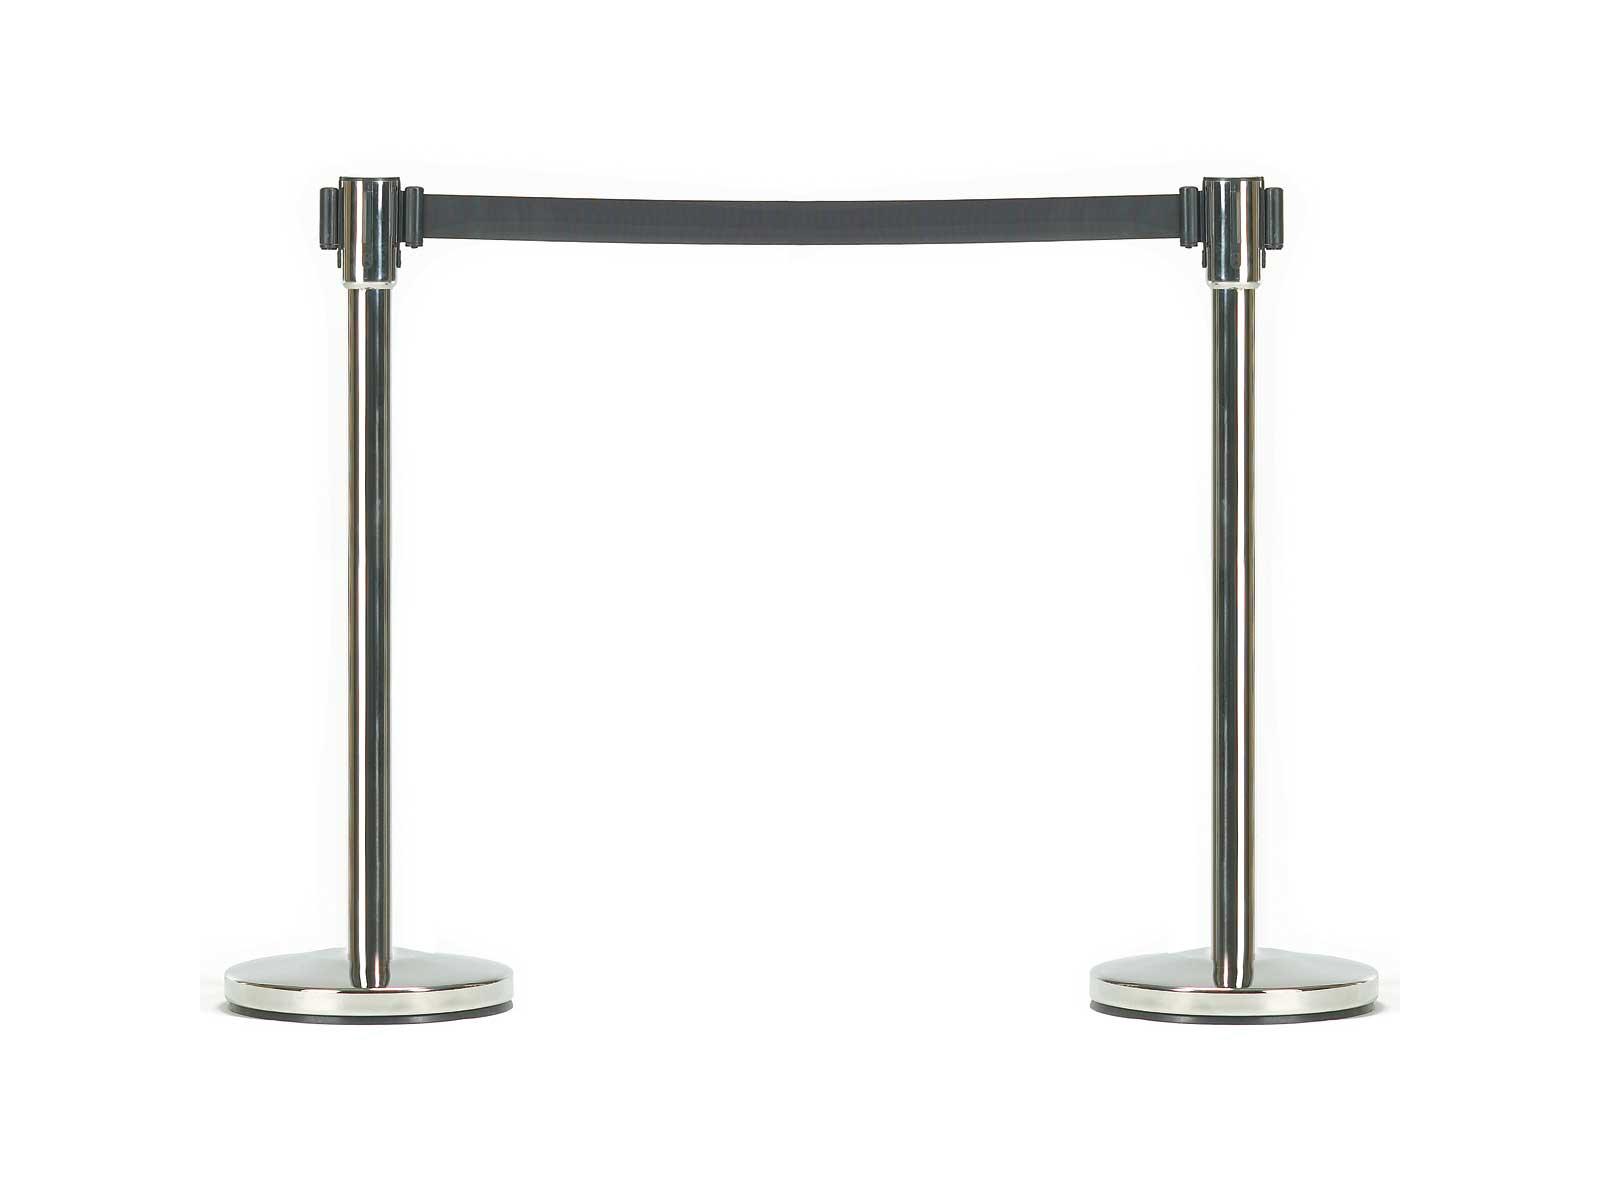 Queue Management Post Base And 2m Retractable Belt